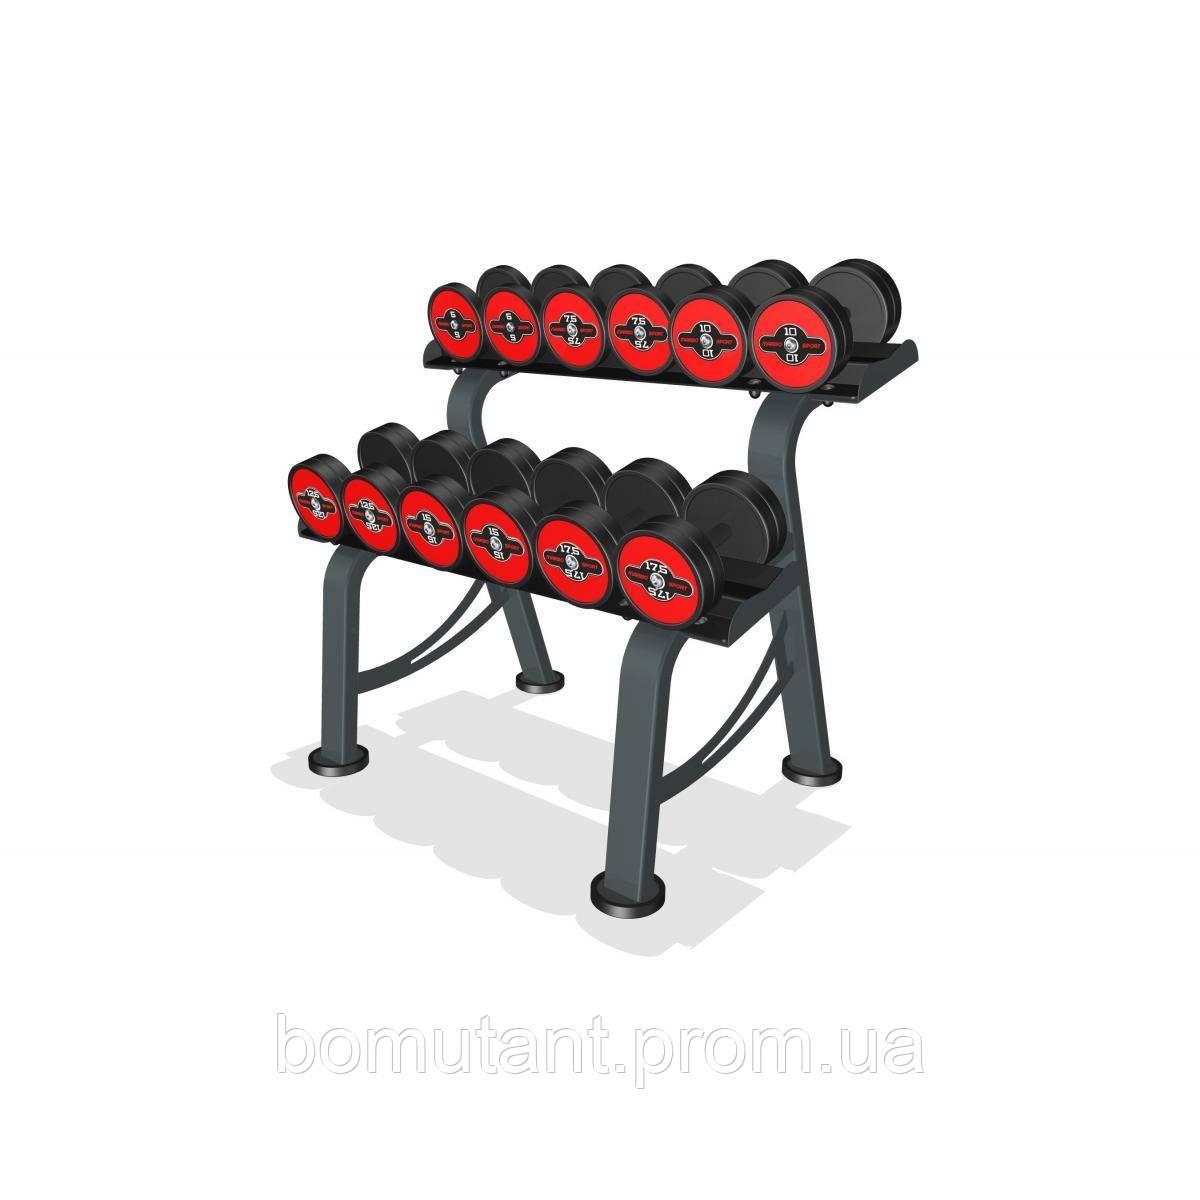 Гантельный ряд Marbo-Sport 5-17,5 кг.